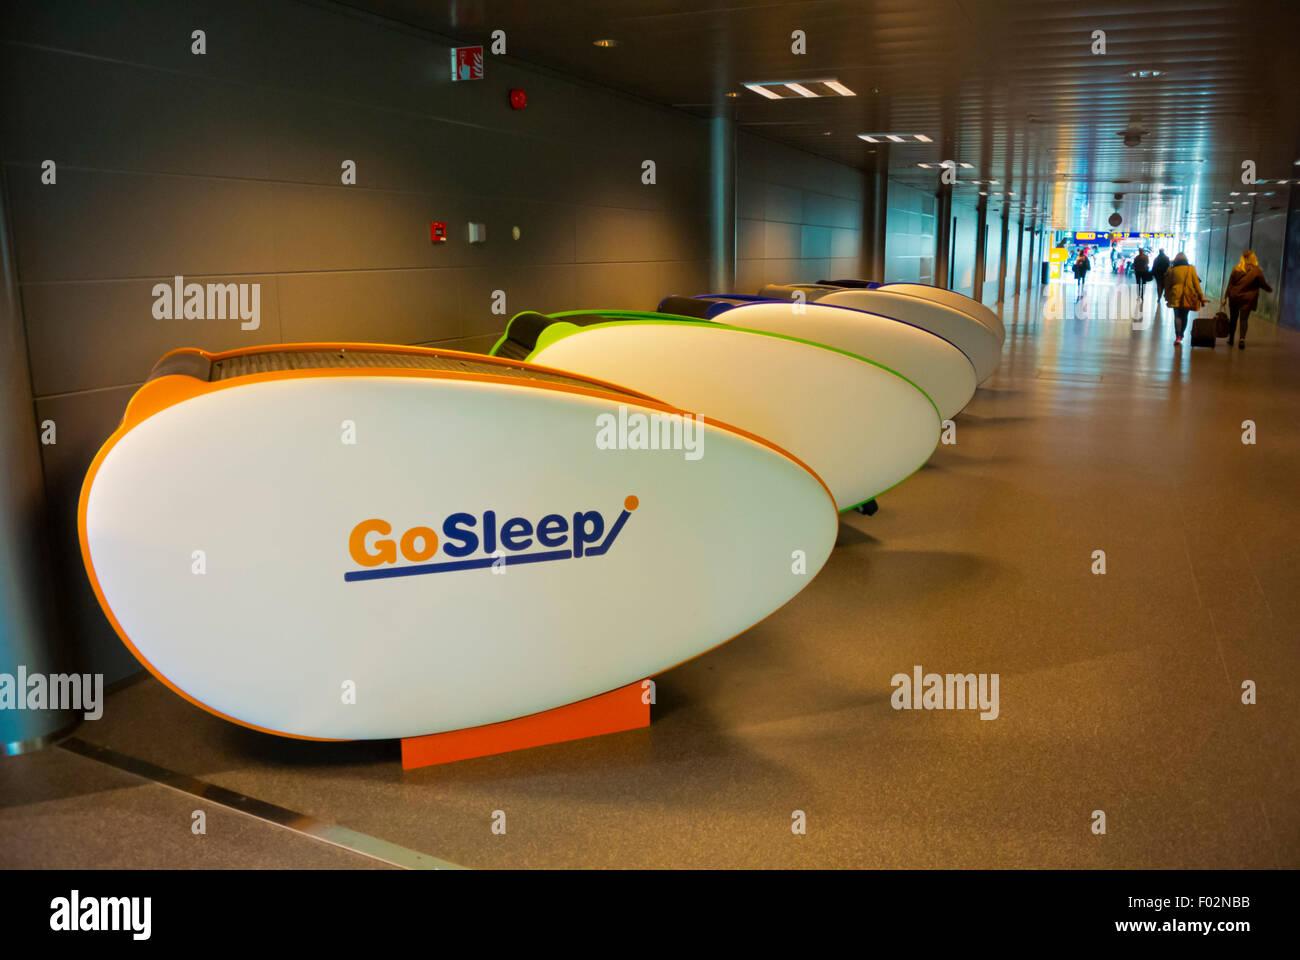 Pods for sleeping, Helsinki-Vantaan lentoasema, airport, Seutula, Vantaa, near Helsinki, Finland - Stock Image